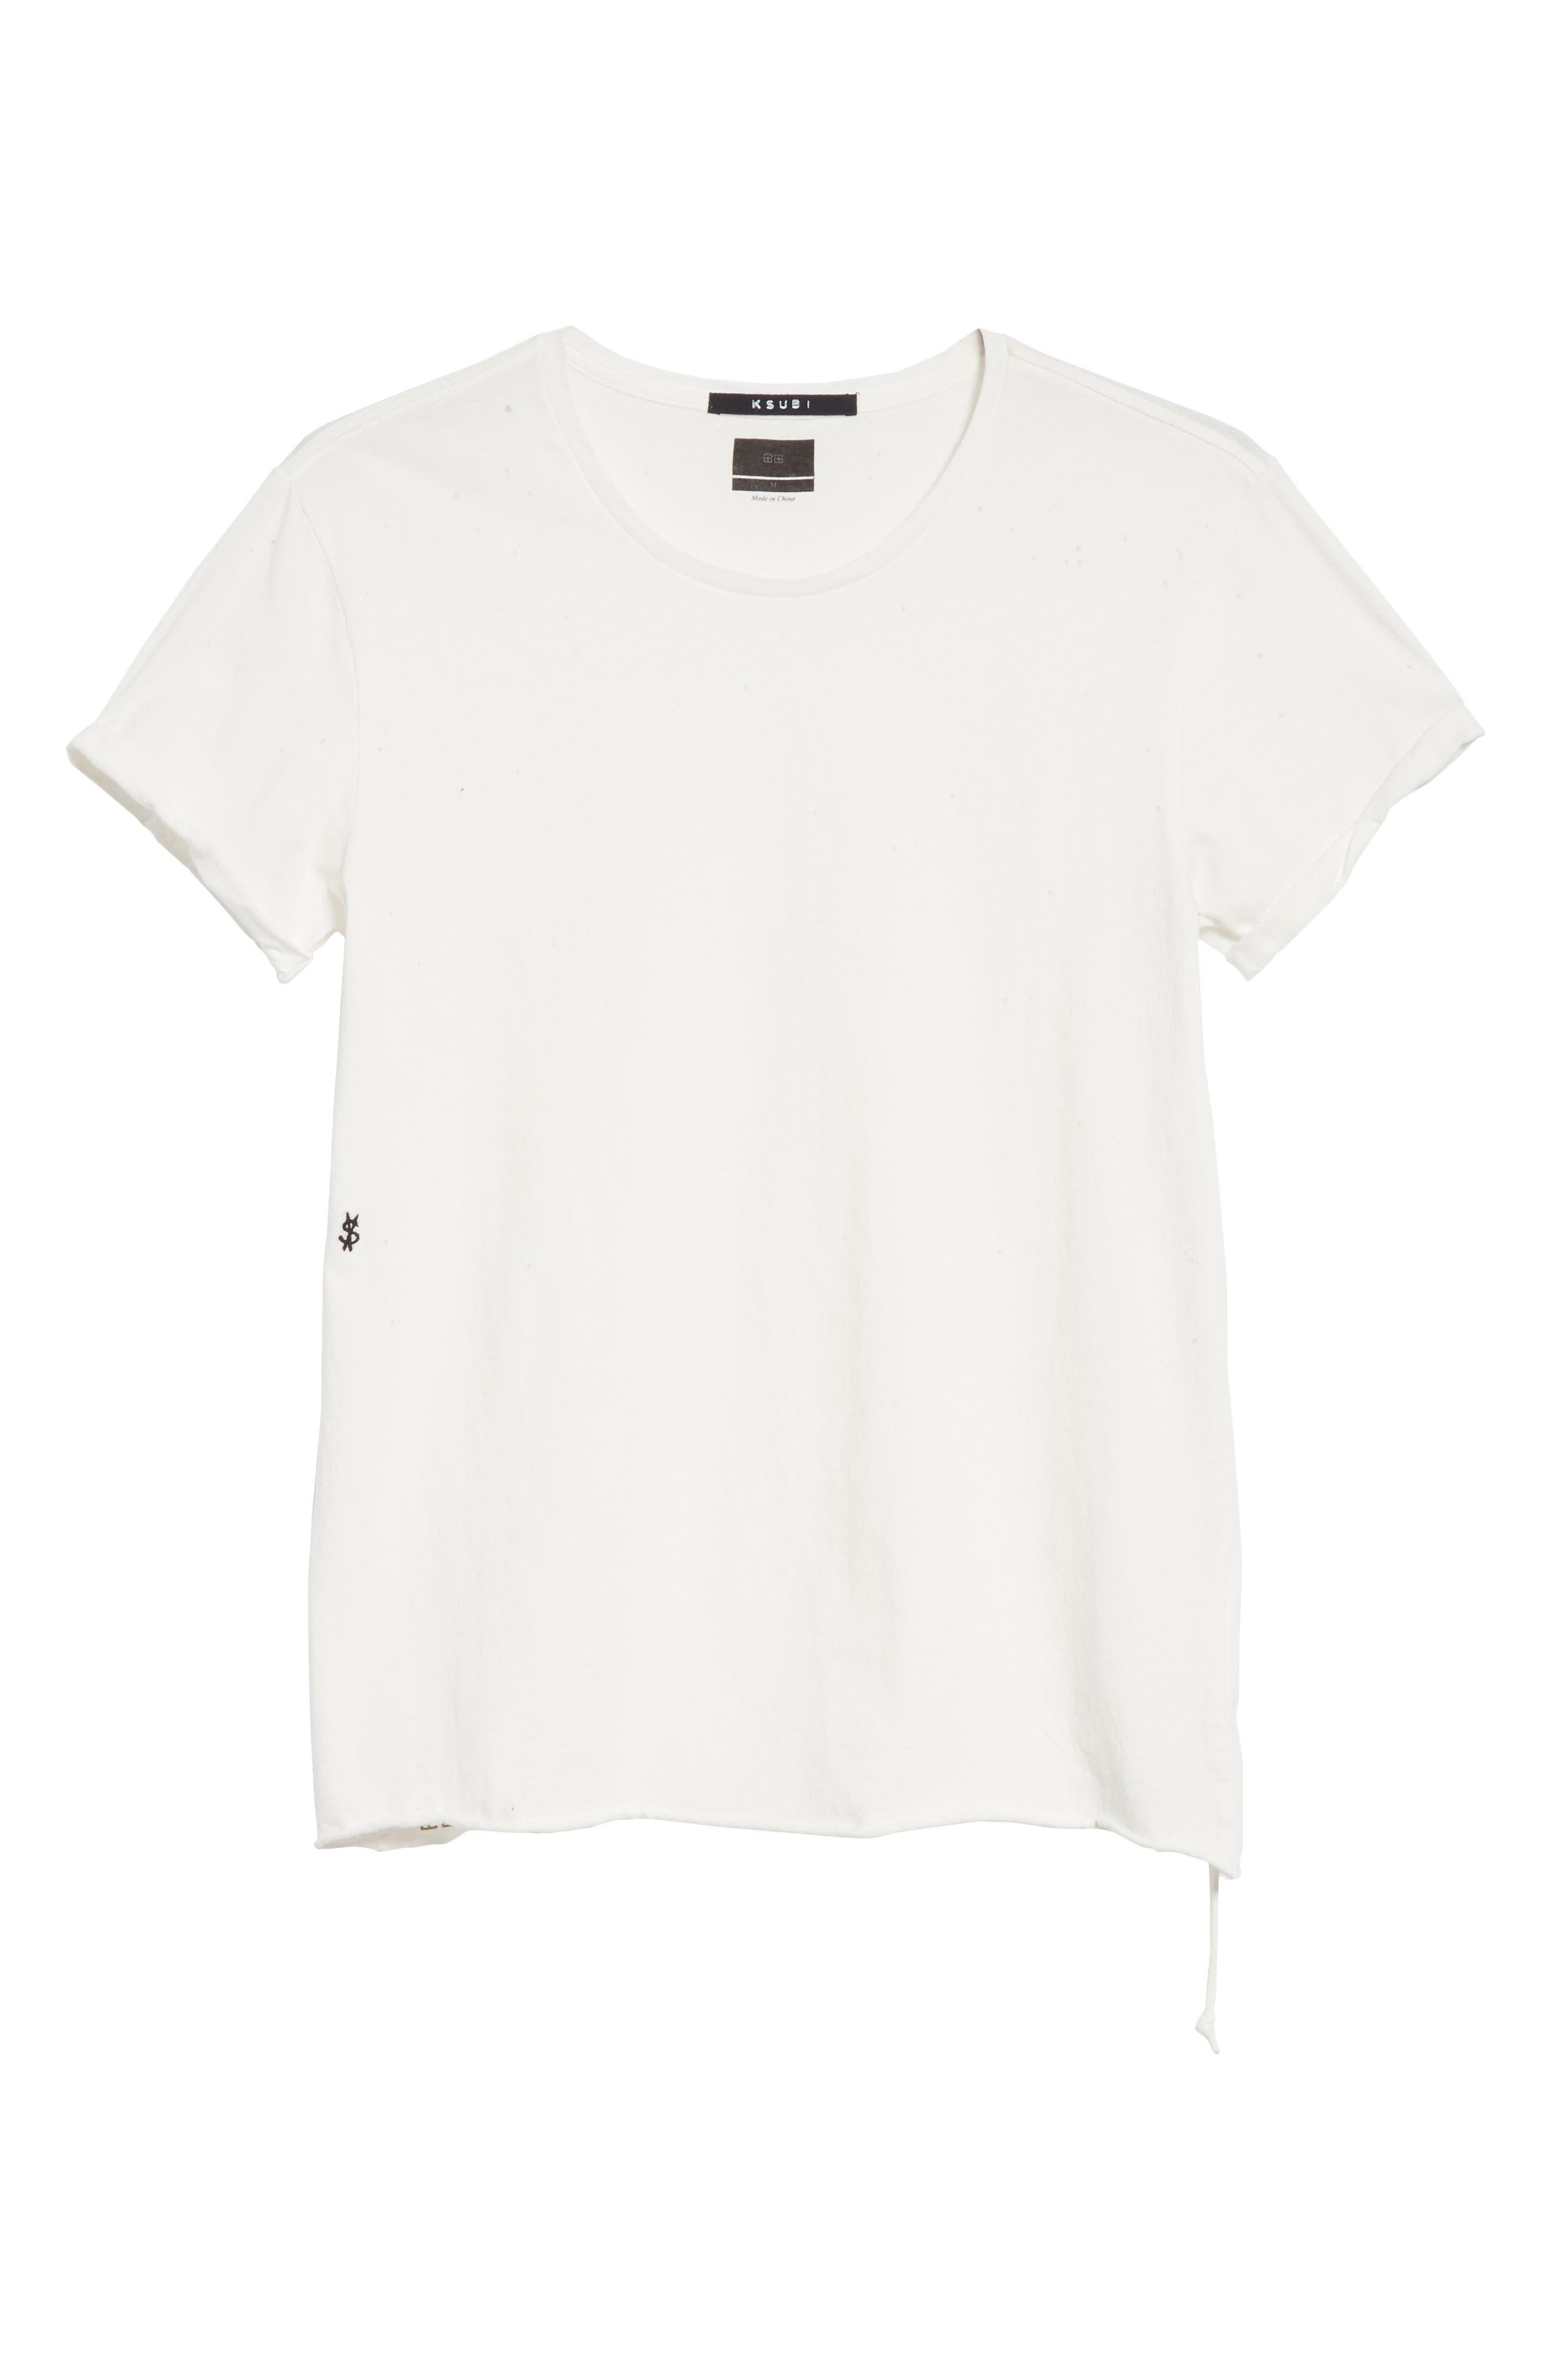 Kodeine Crewneck T-Shirt,                             Alternate thumbnail 6, color,                             WHITE